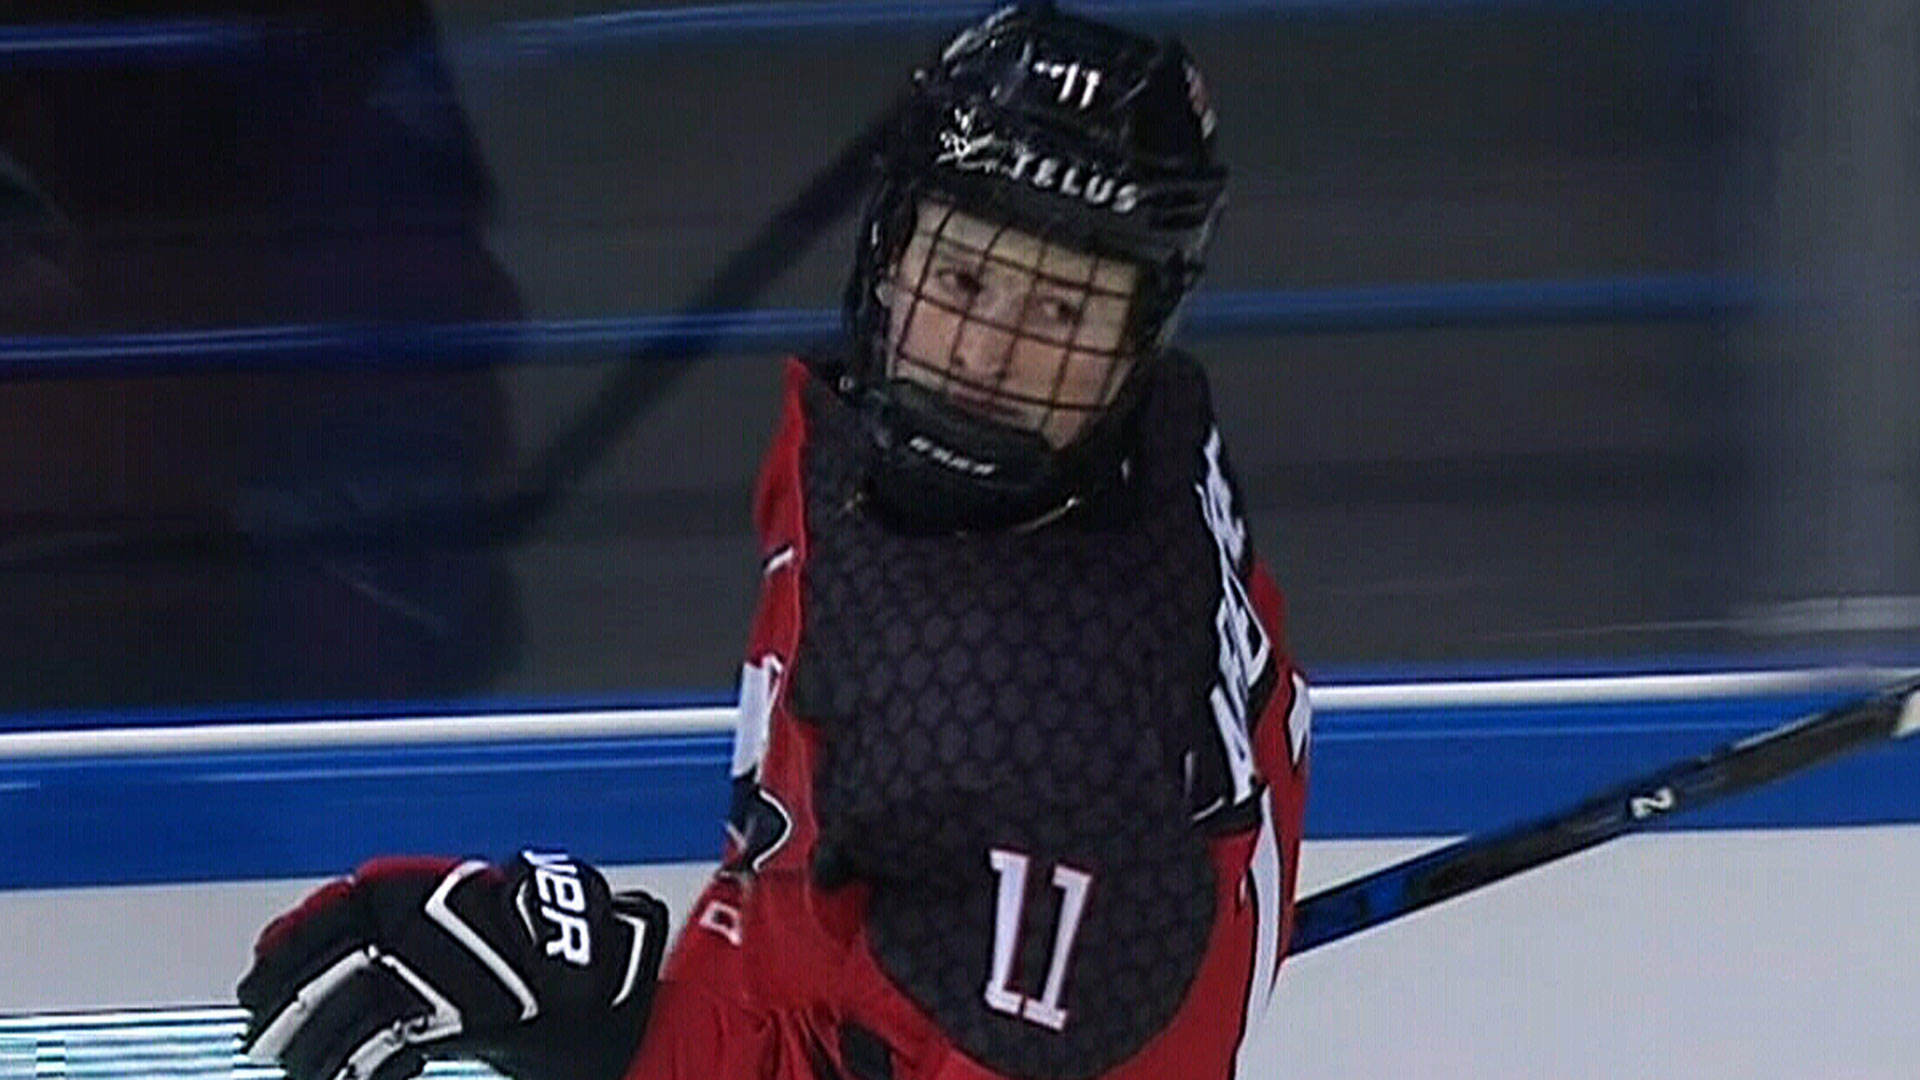 Alexis Lafreniere Highlights World Junior Development Roster Ahead